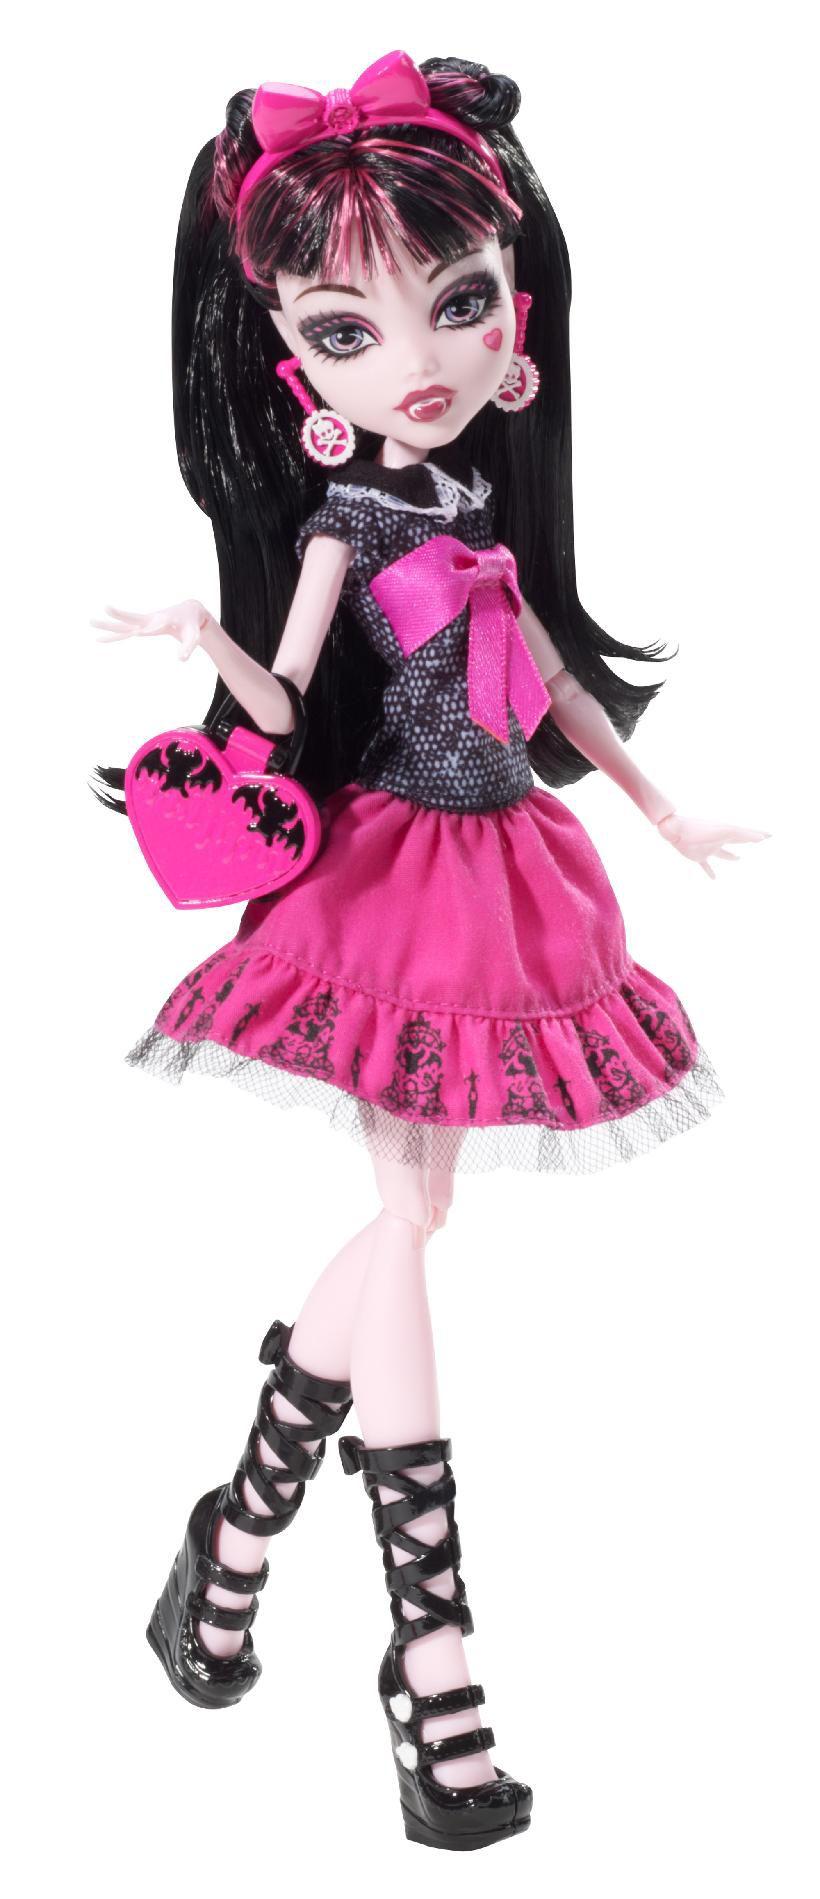 Monster High Draculara® Picture Day Doll 1  sc 1 st  Sears & Monster High Picture Day Draculaura: Vampire Glamor Doll from Kmart